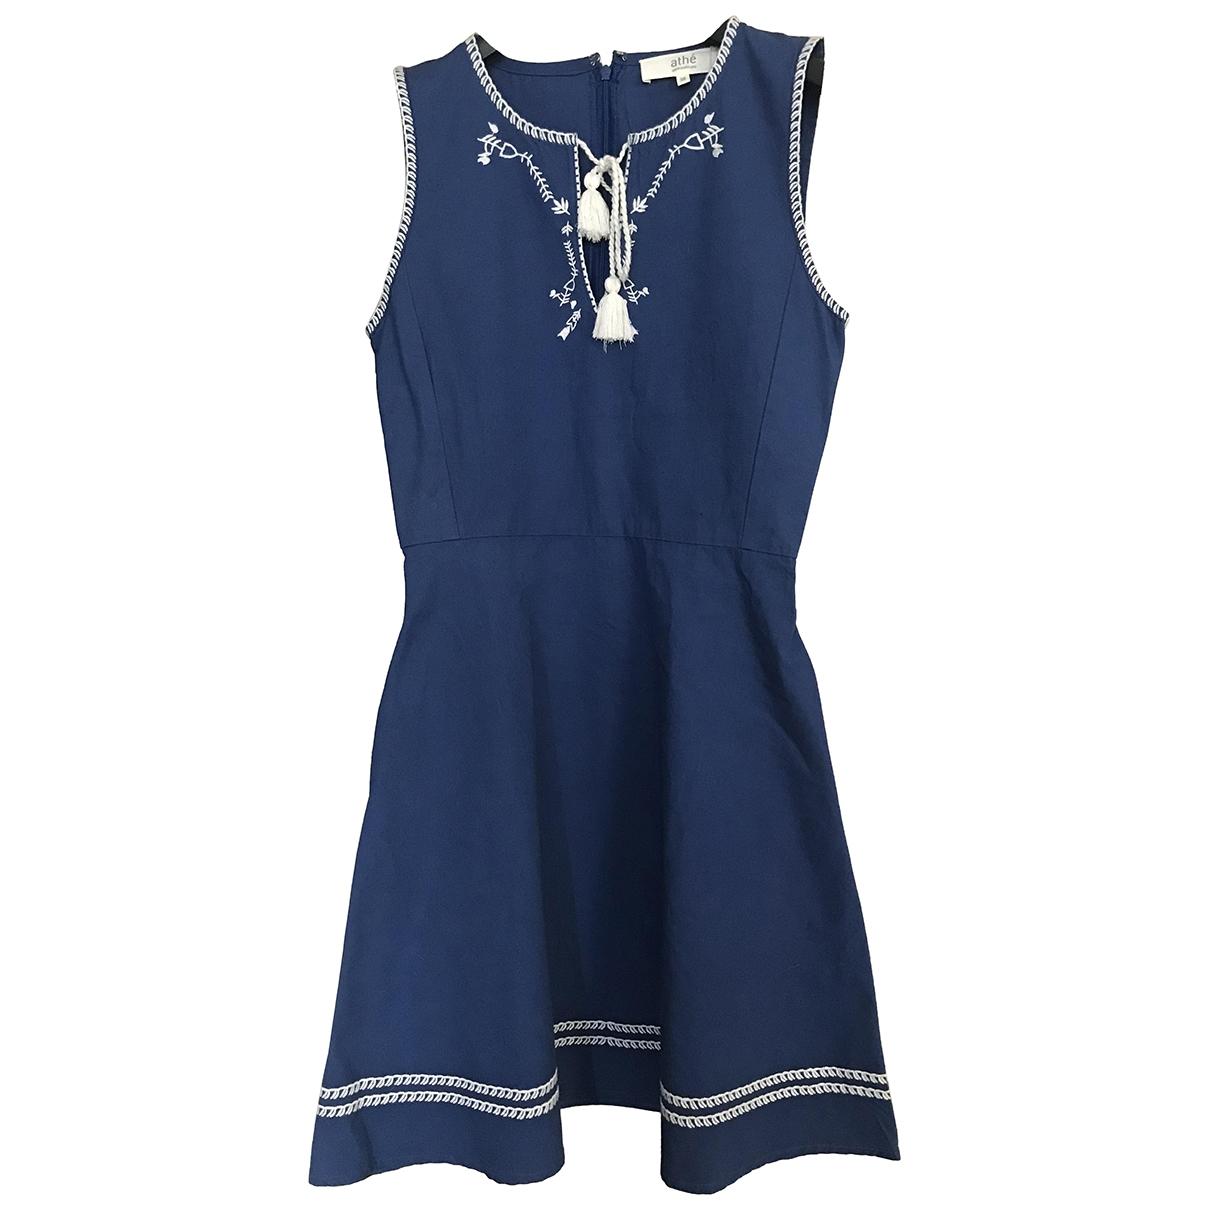 Vanessa Bruno Athe \N Blue Cotton dress for Women 36 FR